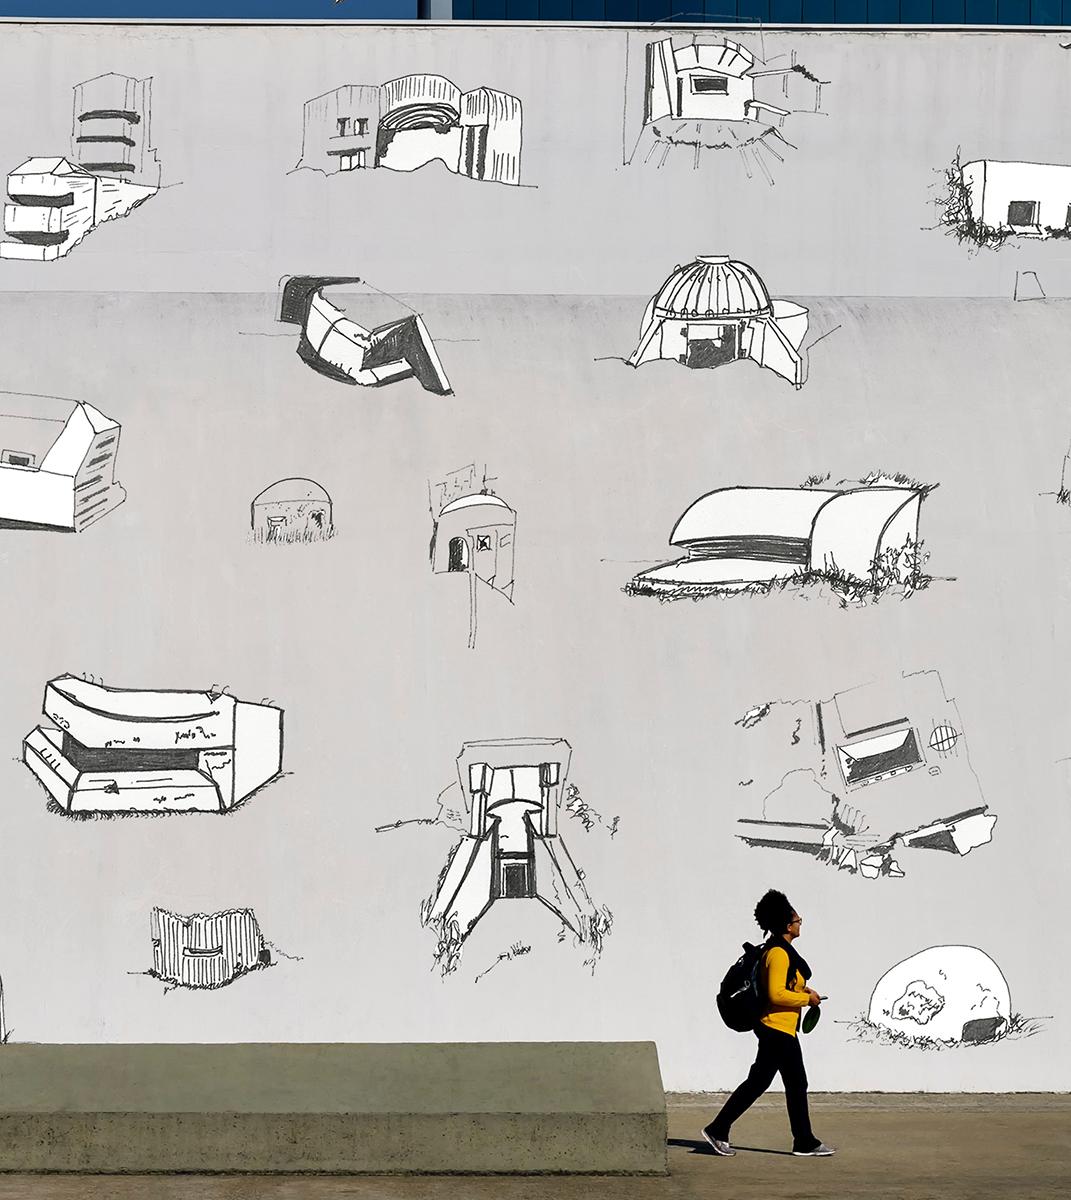 drawing, Project, sculpture, model, public sculpture, public art, architecture, contemporary art, art, Thierry Ferreira, design, installation, sitespecific, photography, video, Landart, arte urbana, Graffiti, Street art, Rébus, Hieróglifo, tag